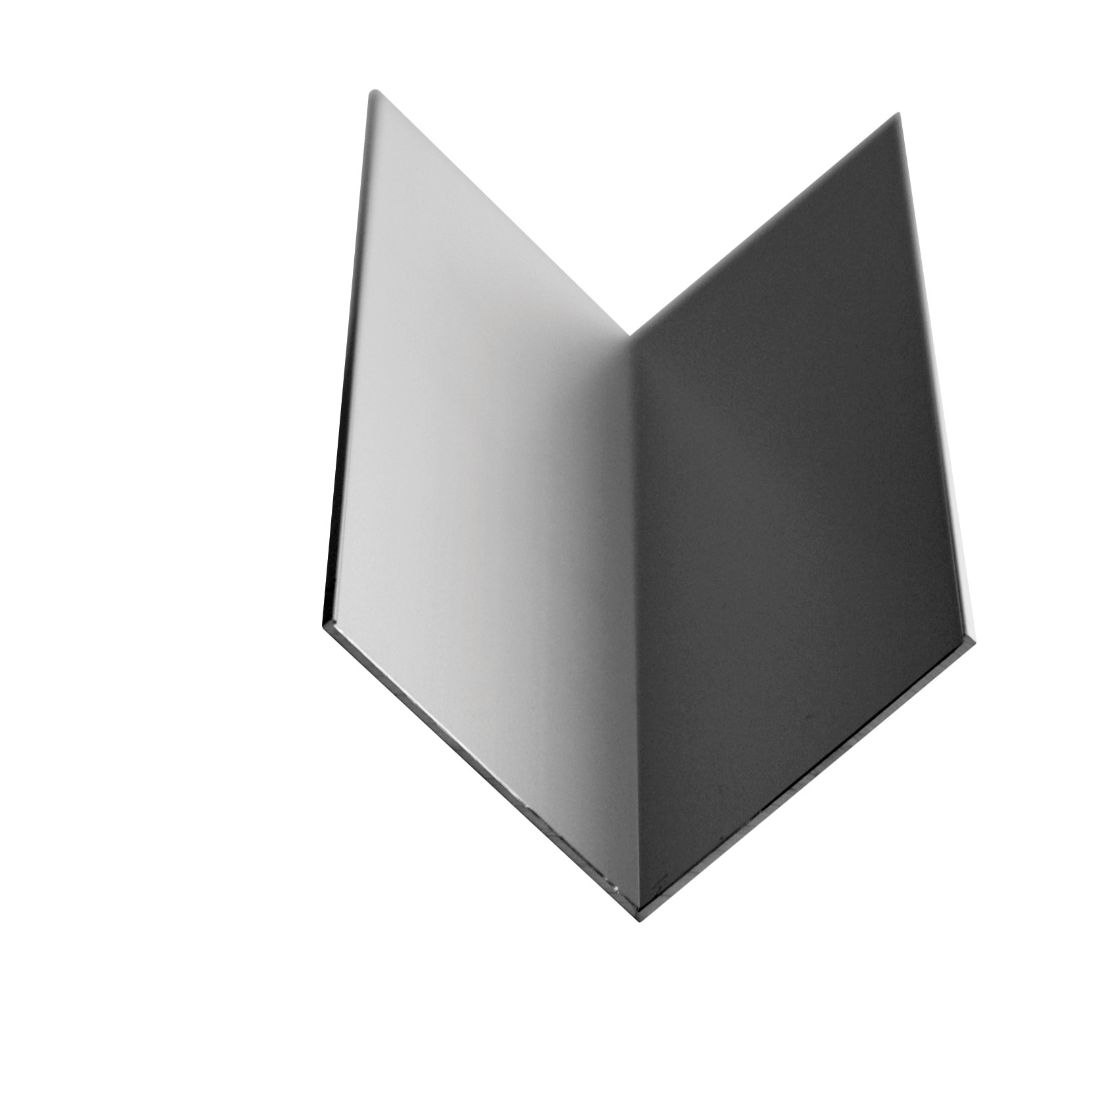 Shadowclad Internal 90 Angle Aluminium Flashing 3.0m